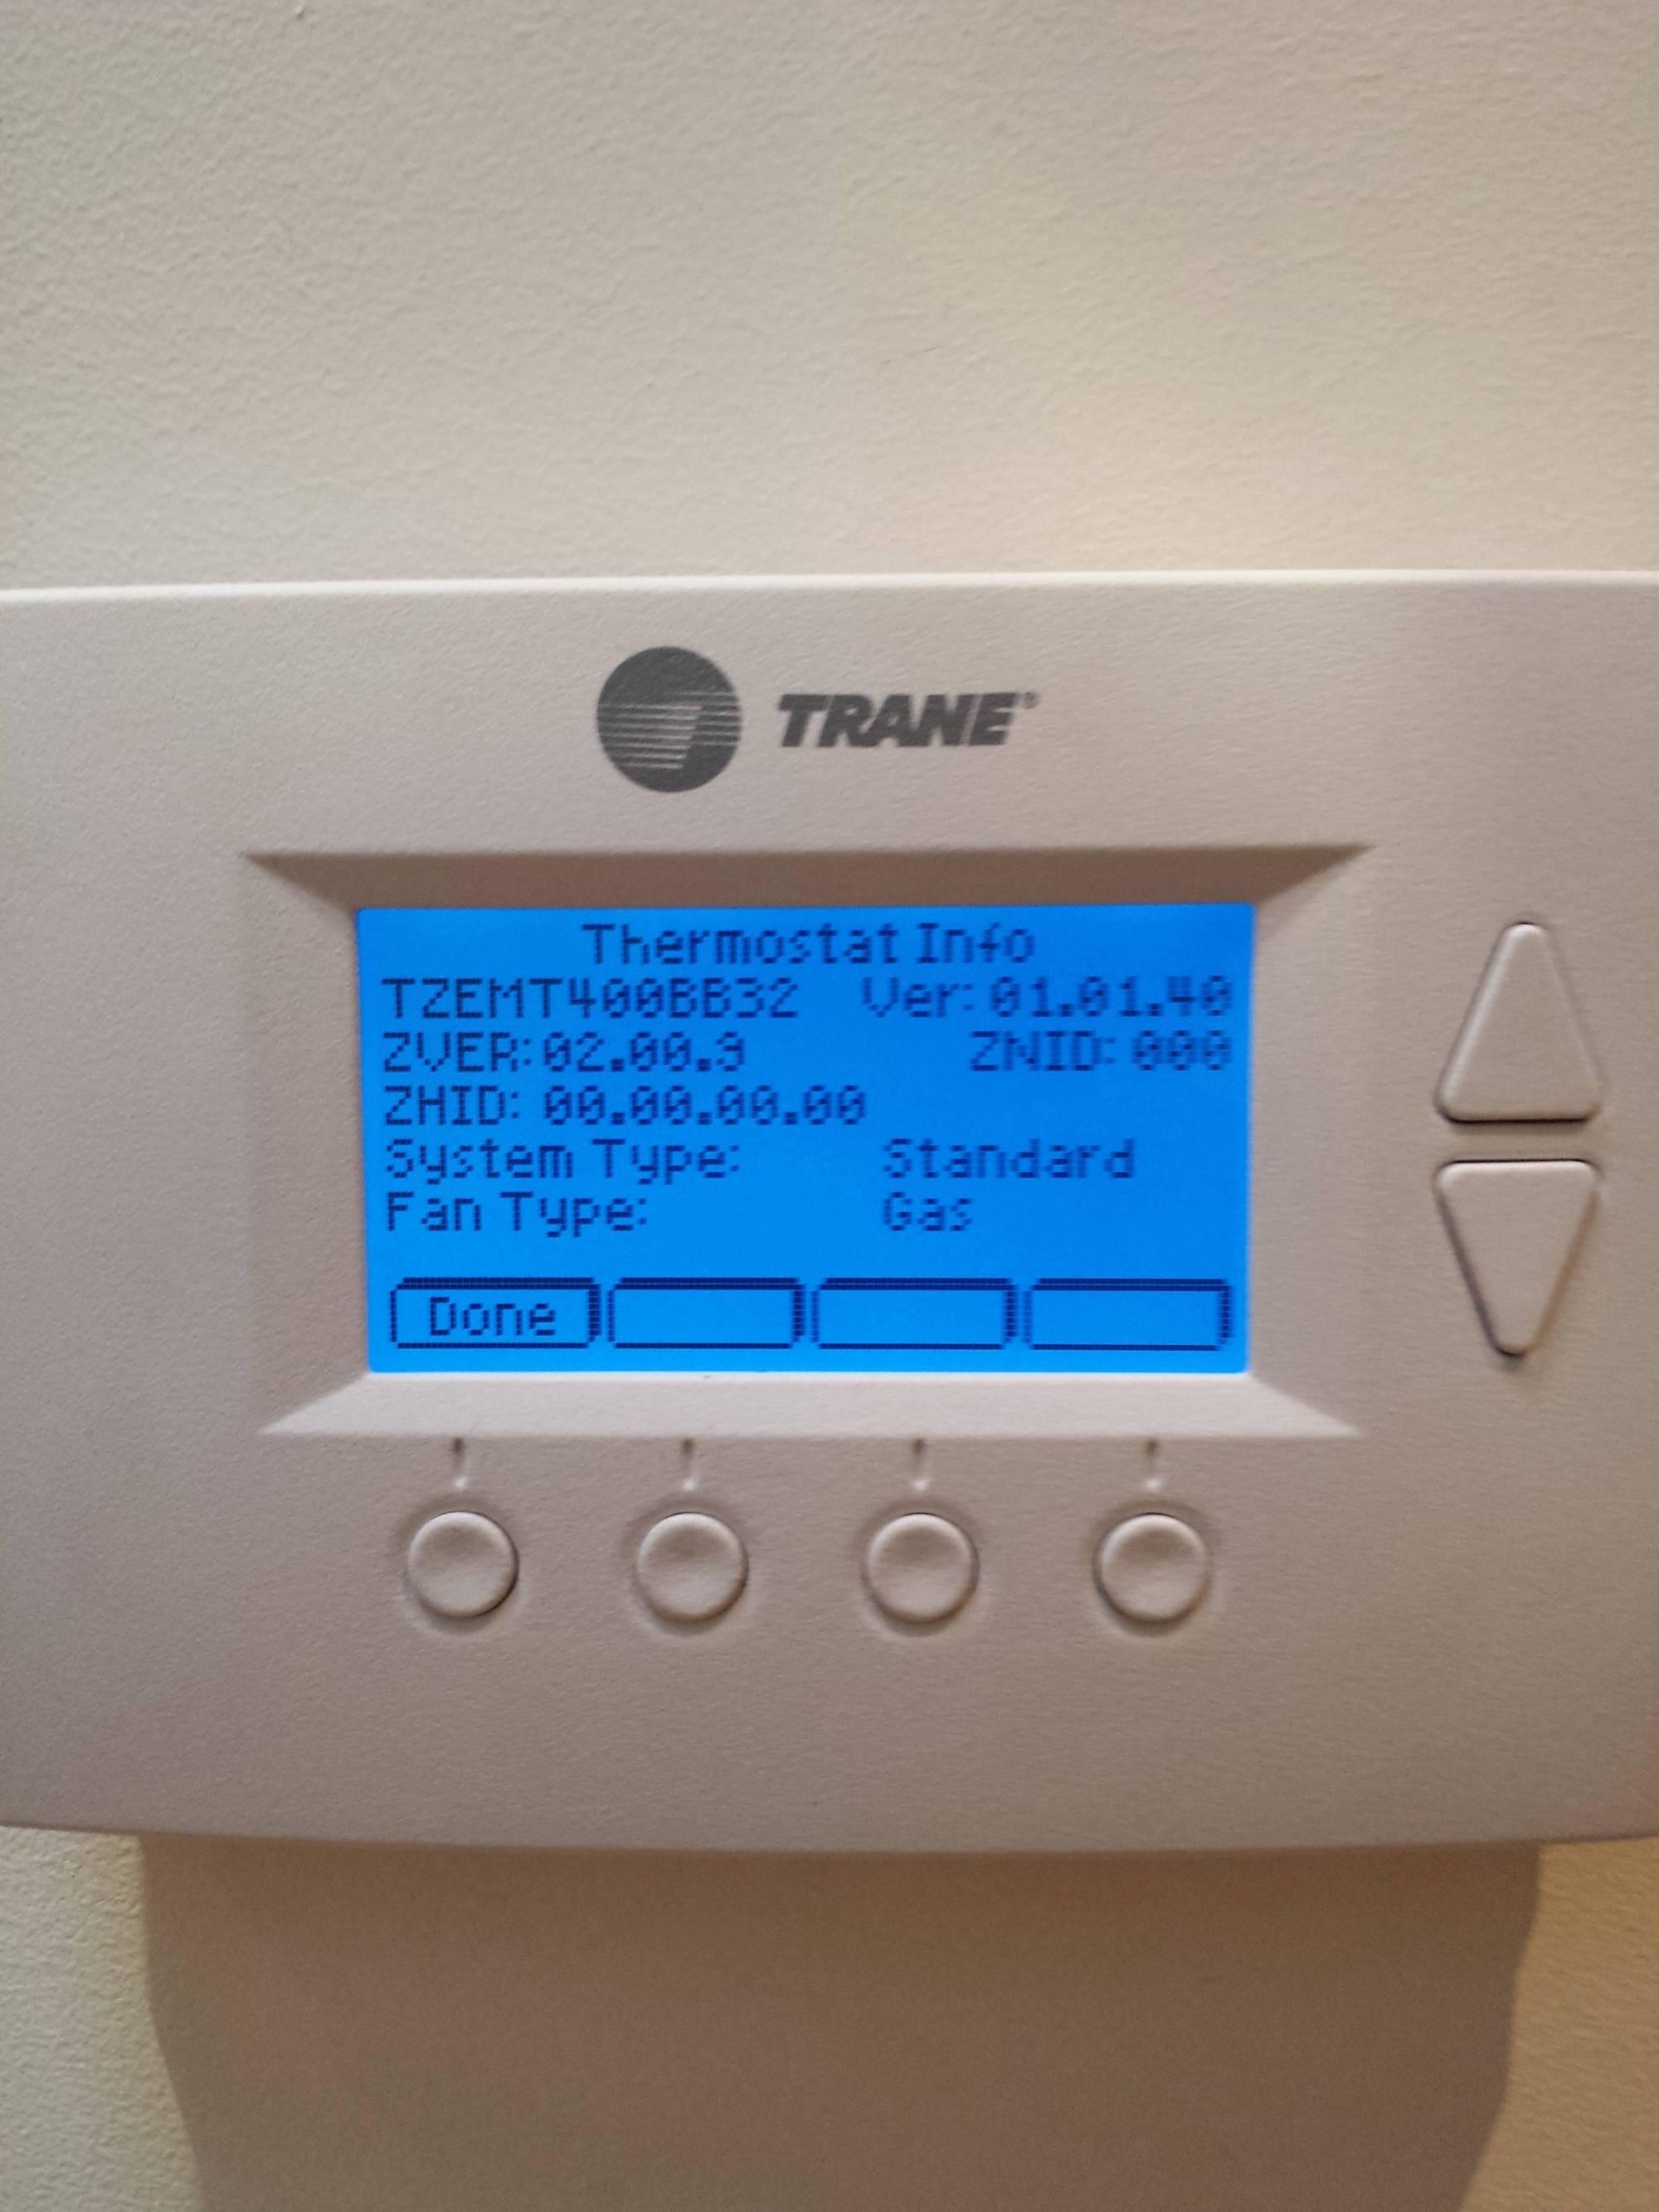 hight resolution of thermostat transformer wiring 24 volt thermostat wiring 24 volt thermostat wiring diagram 120 volt thermostat wiring